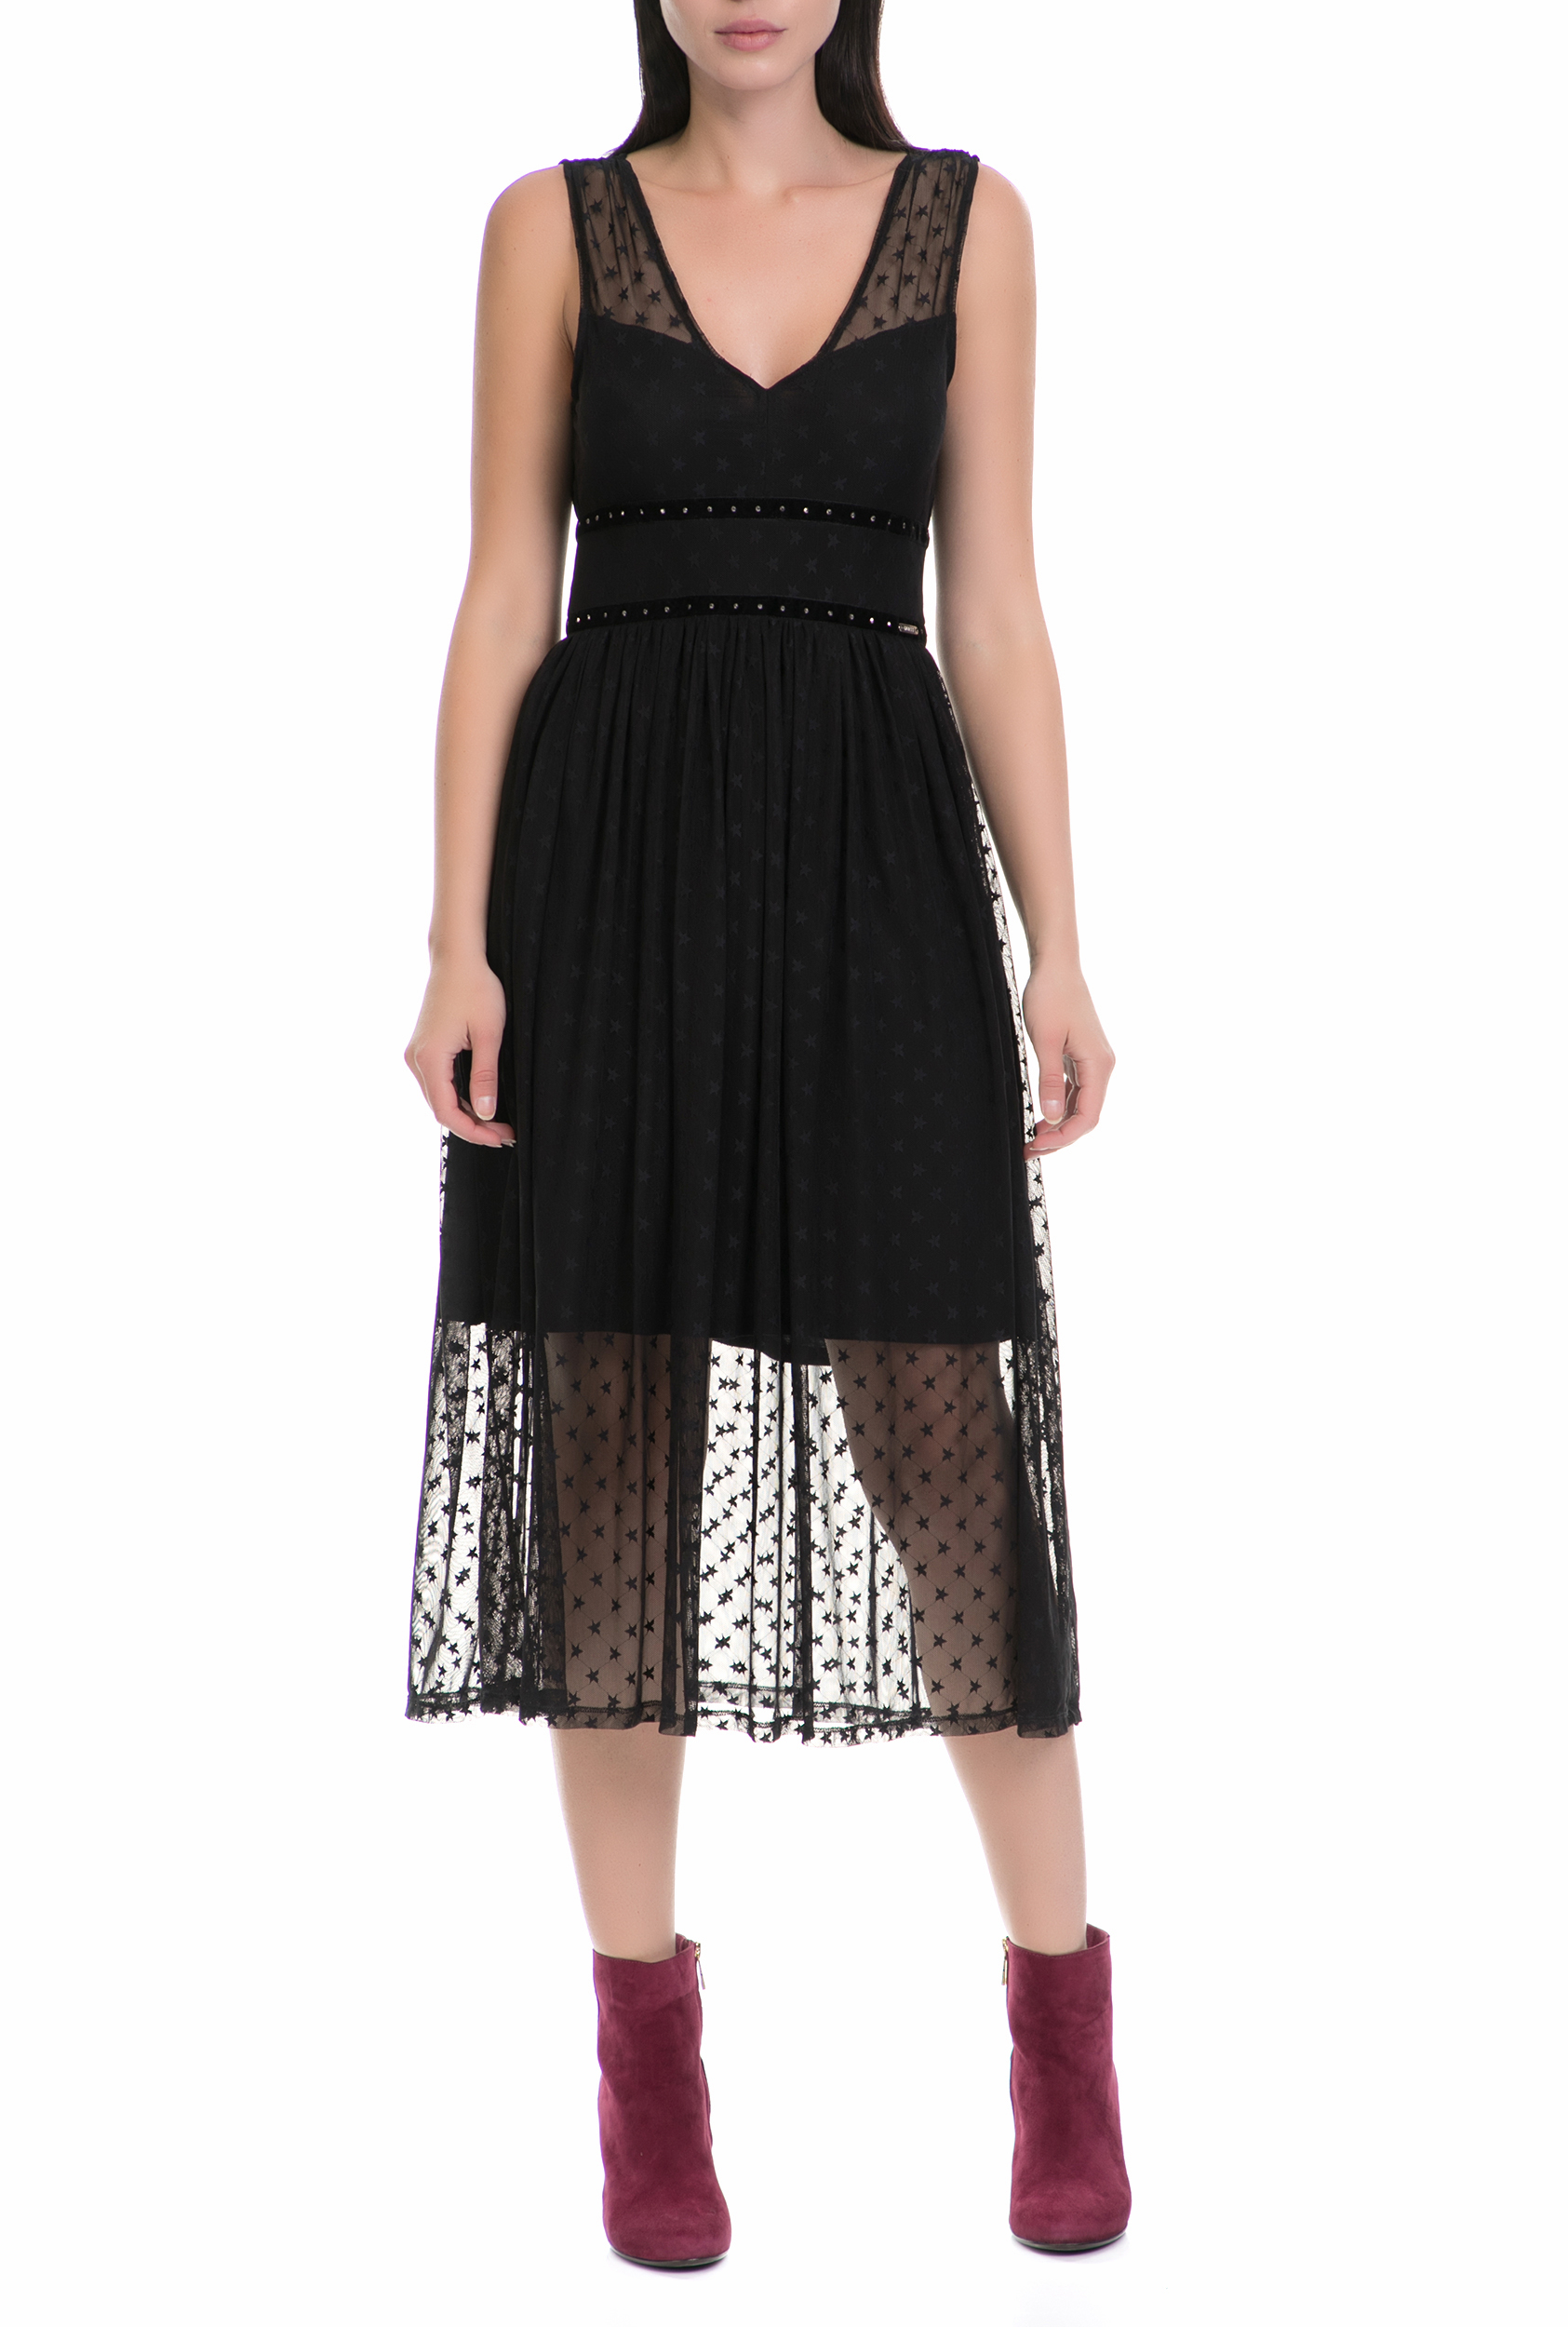 GUESS - Γυναικείο φόρεμα SILVIA GUESS μαύρο γυναικεία ρούχα φορέματα μέχρι το γόνατο